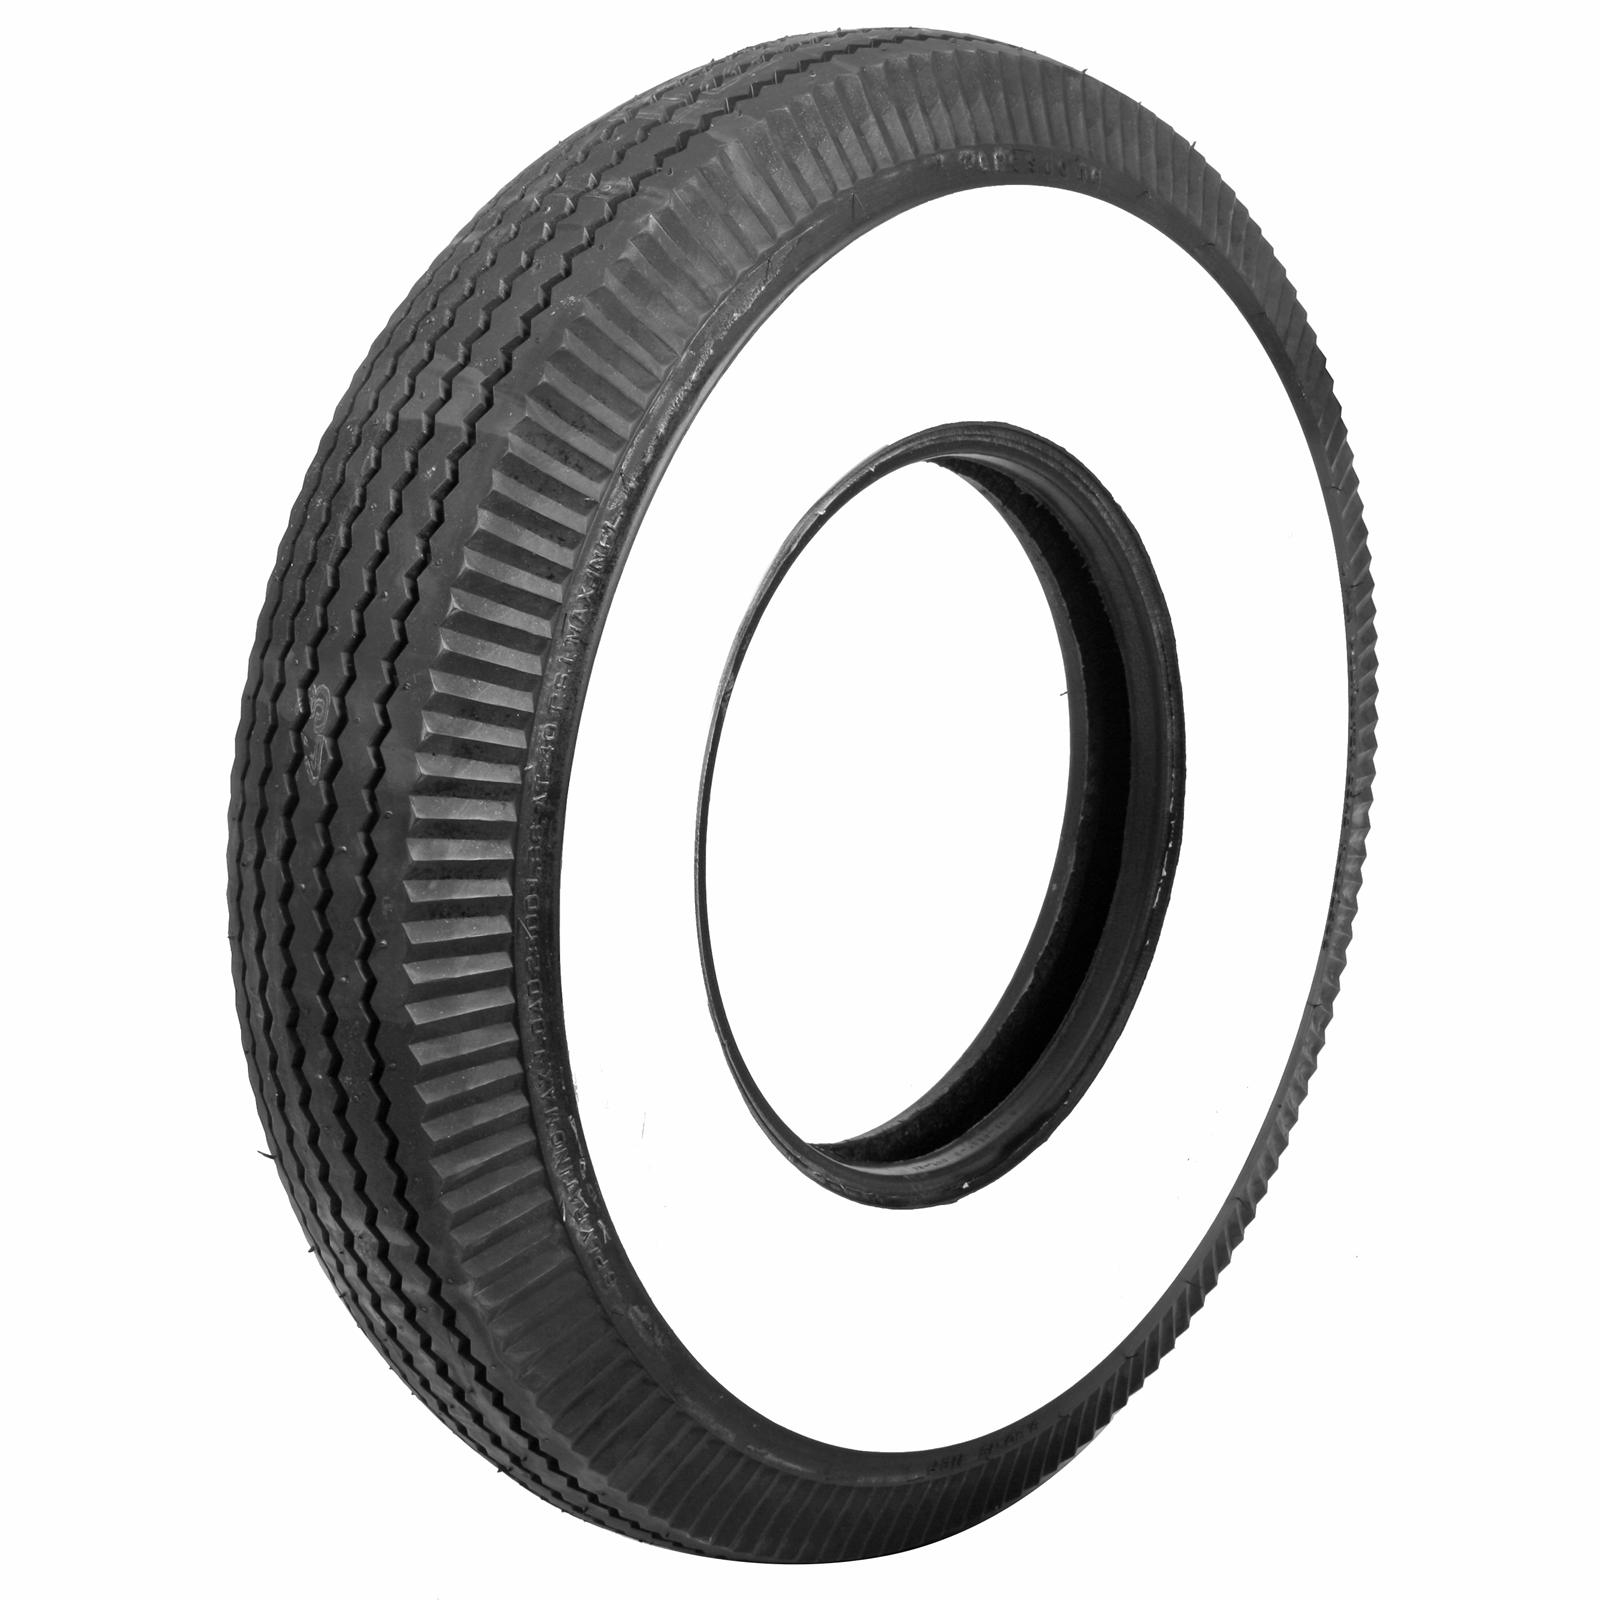 Sell Coker Firestone Vintage Bias Tire 8 90 15 Whitewall Bias Ply